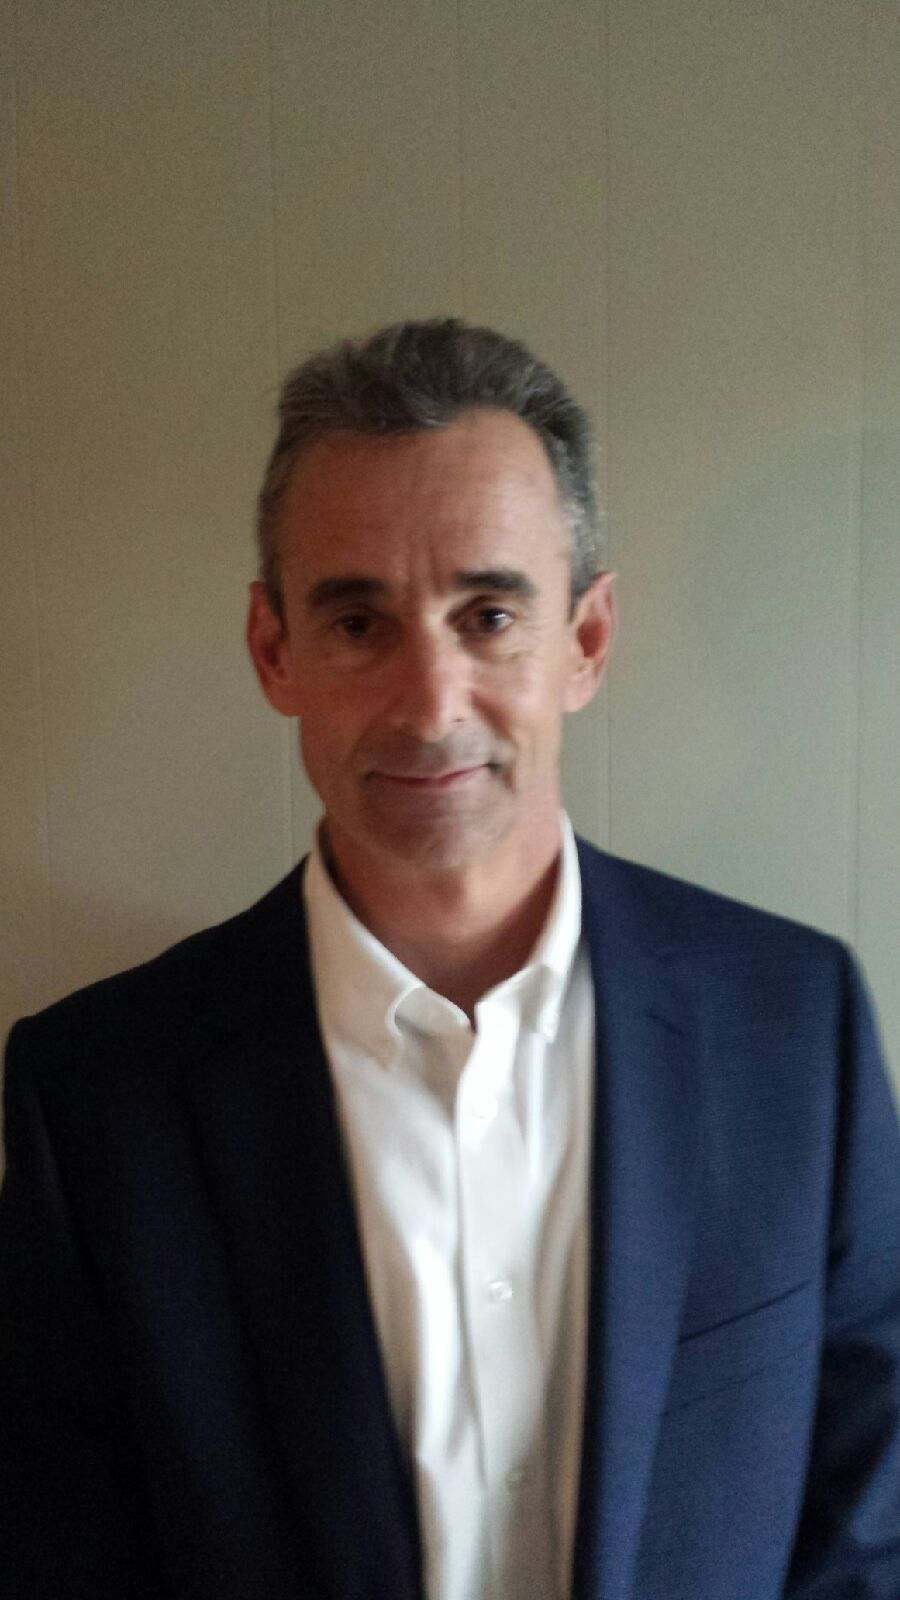 Pete Dotsey   Director - Business Development